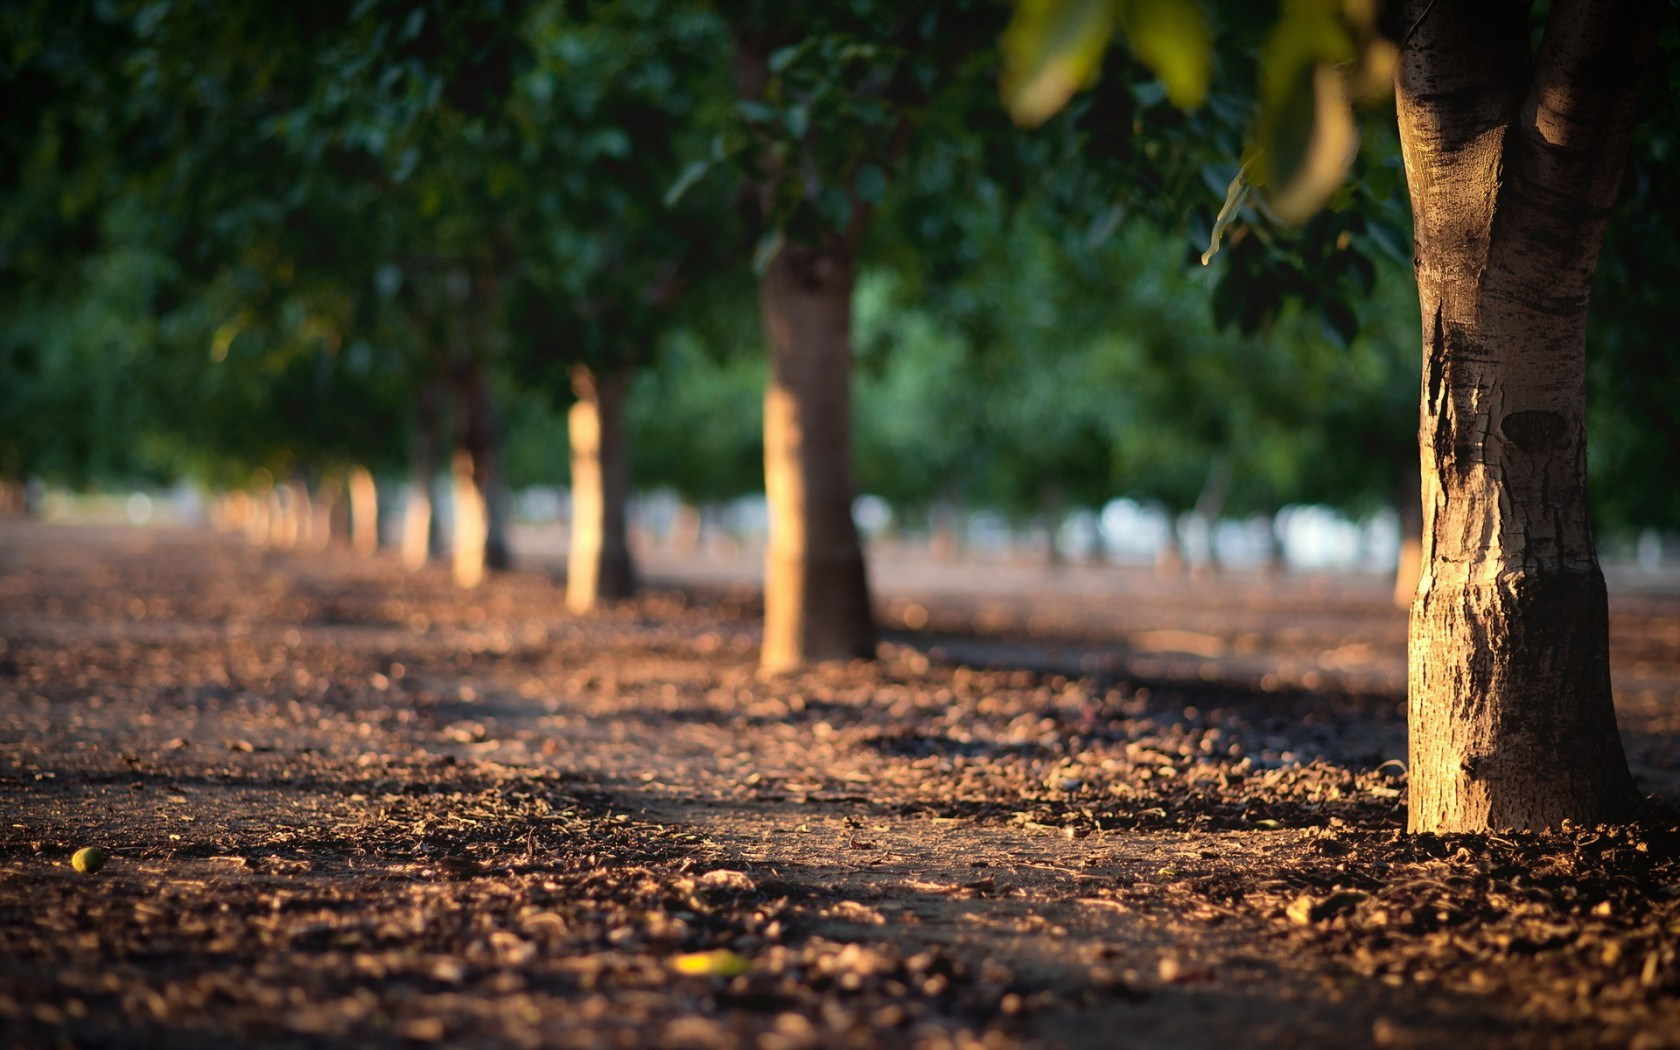 Depth Photo 3d Live Wallpaper Download Tree Pictures Photography Hd Desktop Wallpapers 4k Hd